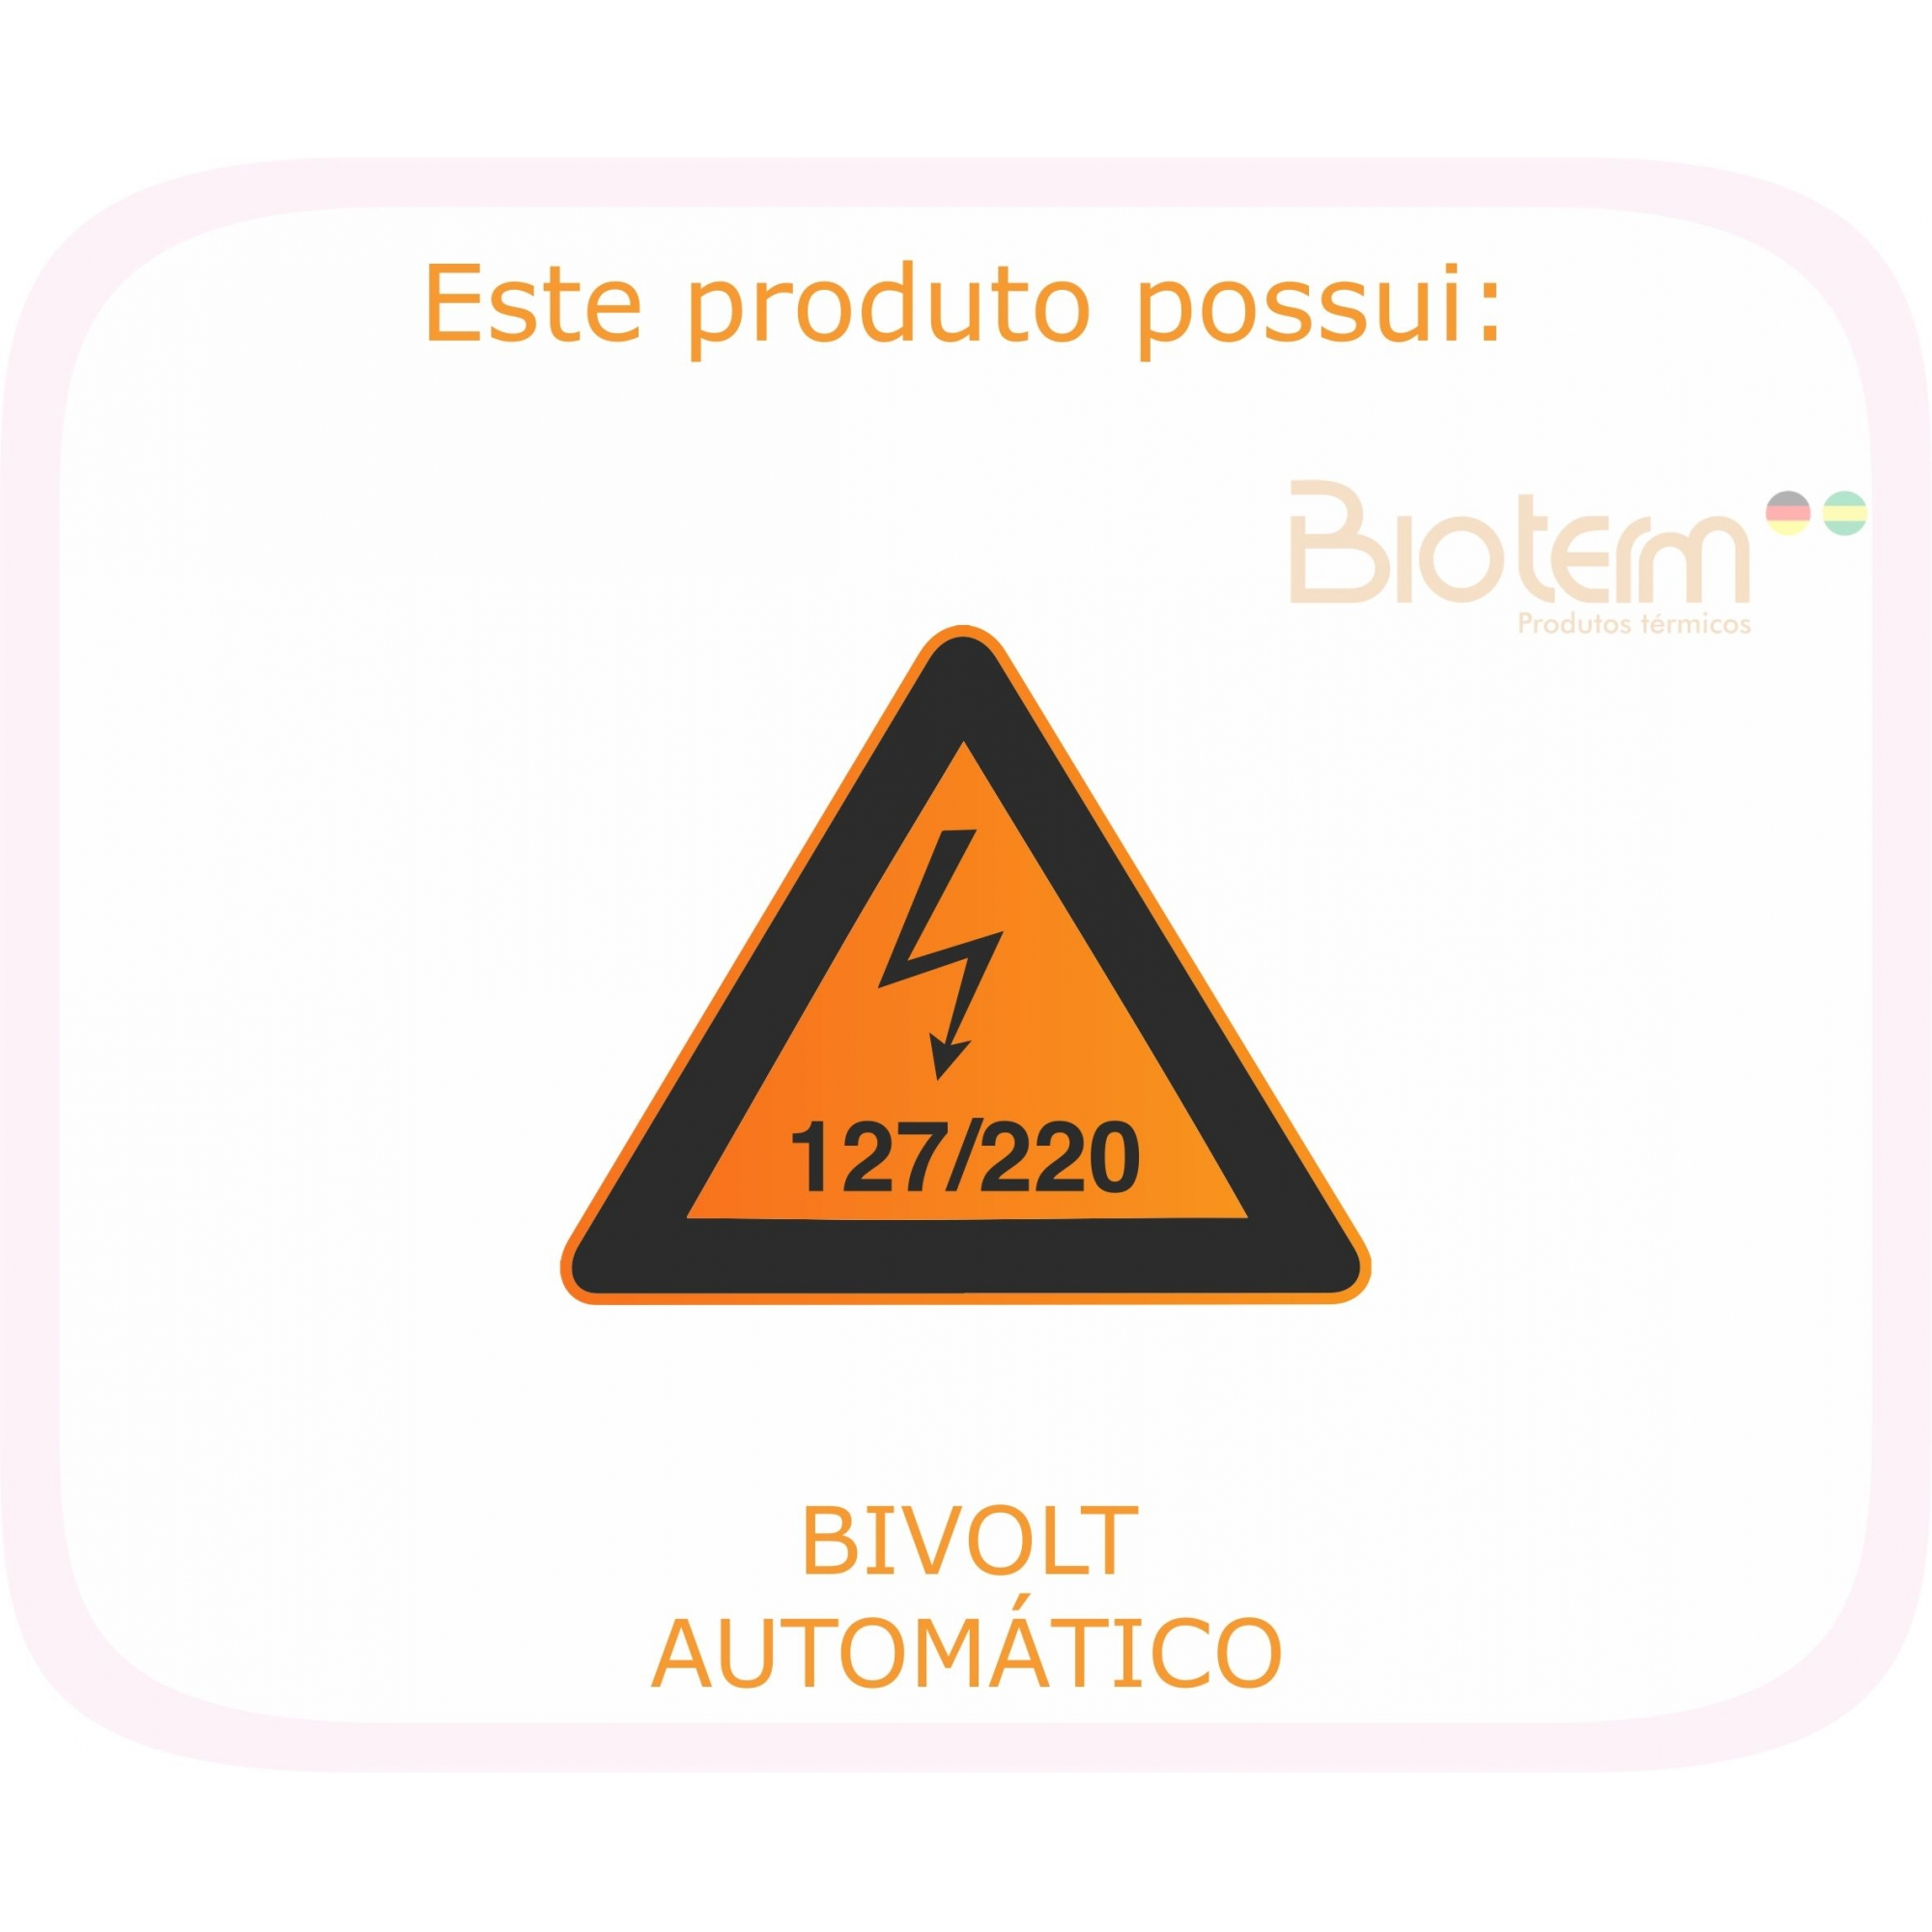 Manta Termoelétrica Massageadora Meio Corpo Digital Bivolt Automático Bio Term